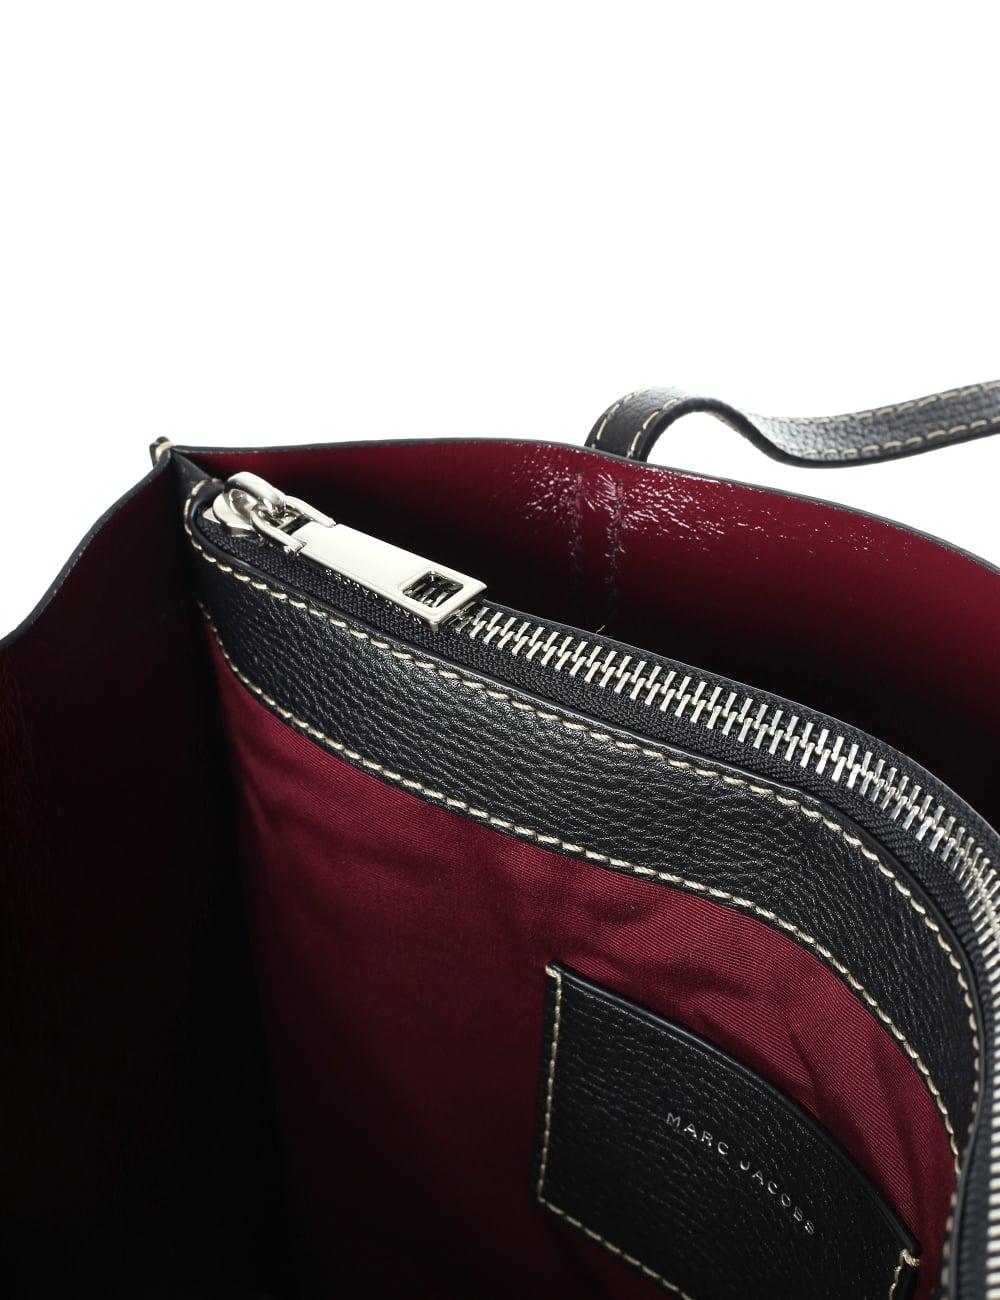 6bcd1f5d59c5 Marc Jacobs Women s The bold Grind Shopper Tote Bag